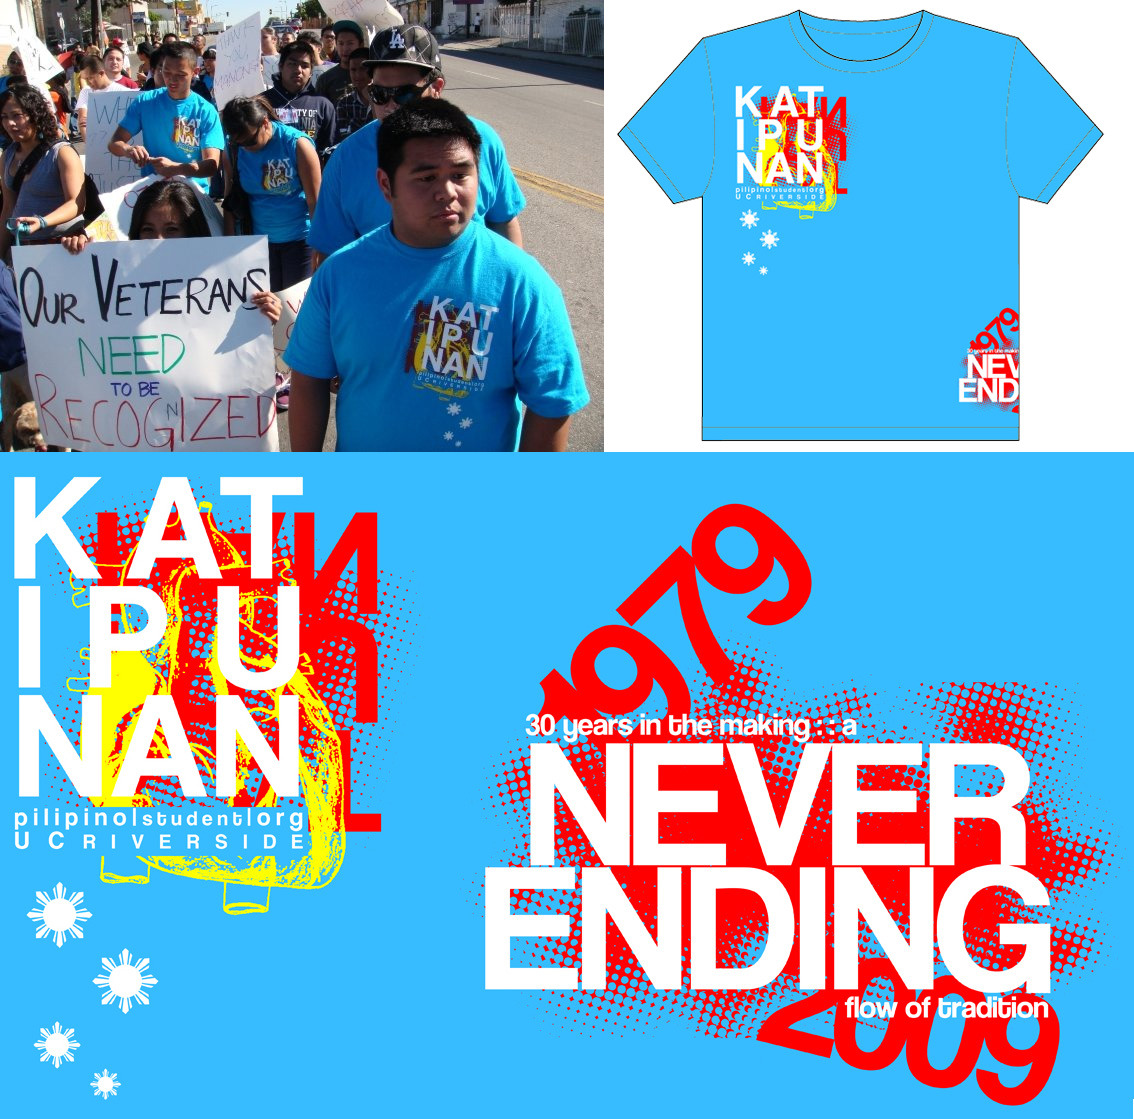 Design for Katipunan Pilipino Student Organization at UC Riverside (2009)